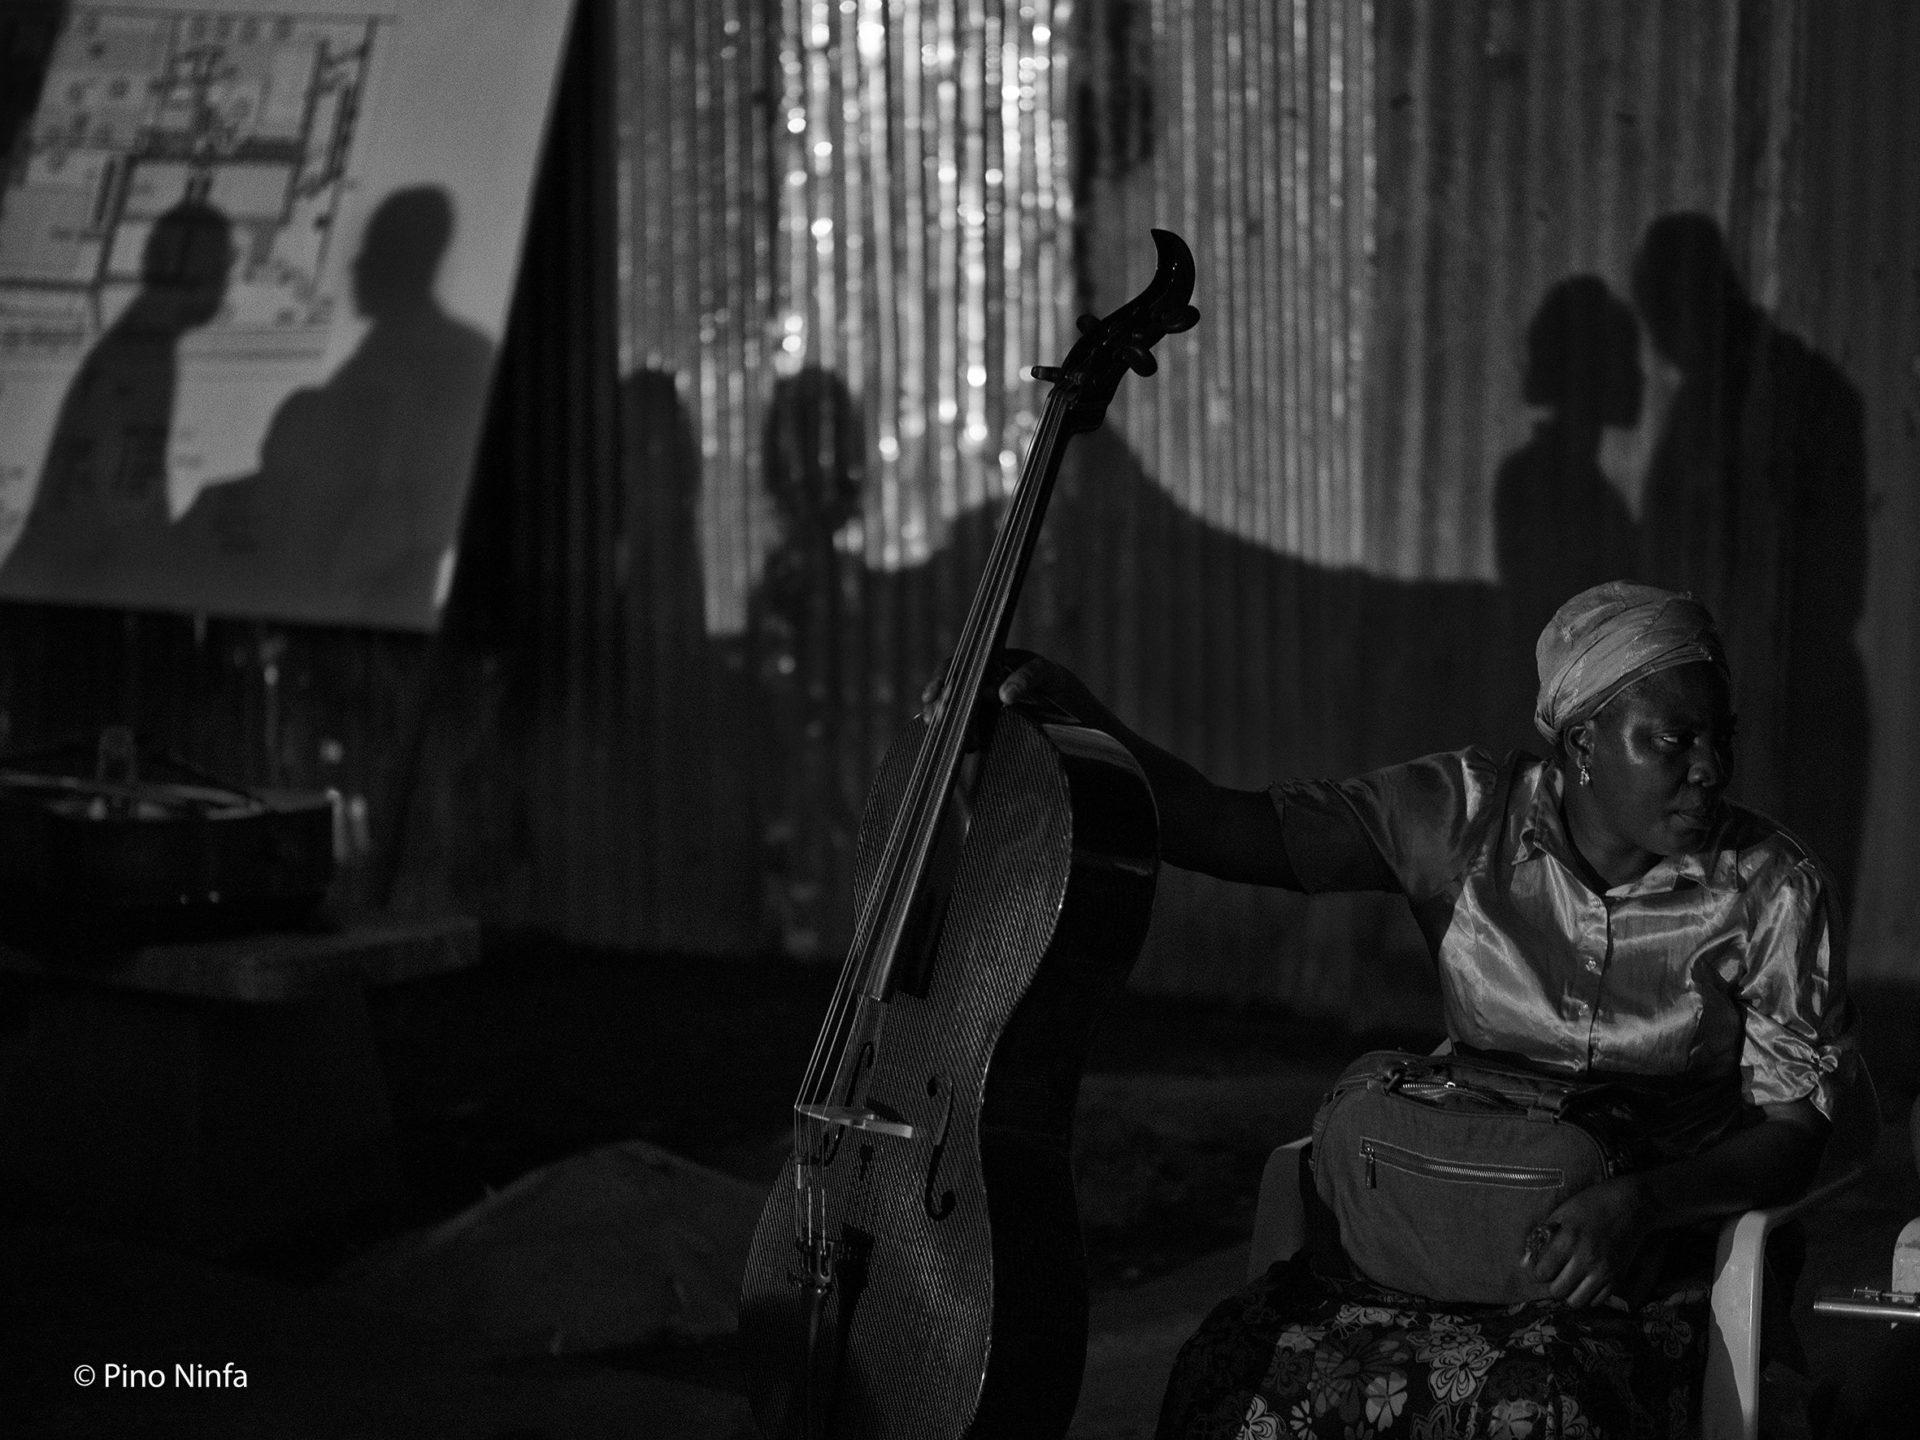 ┬® pino ninfa porgy and bess a kinshasa copia - Milano Photofestival